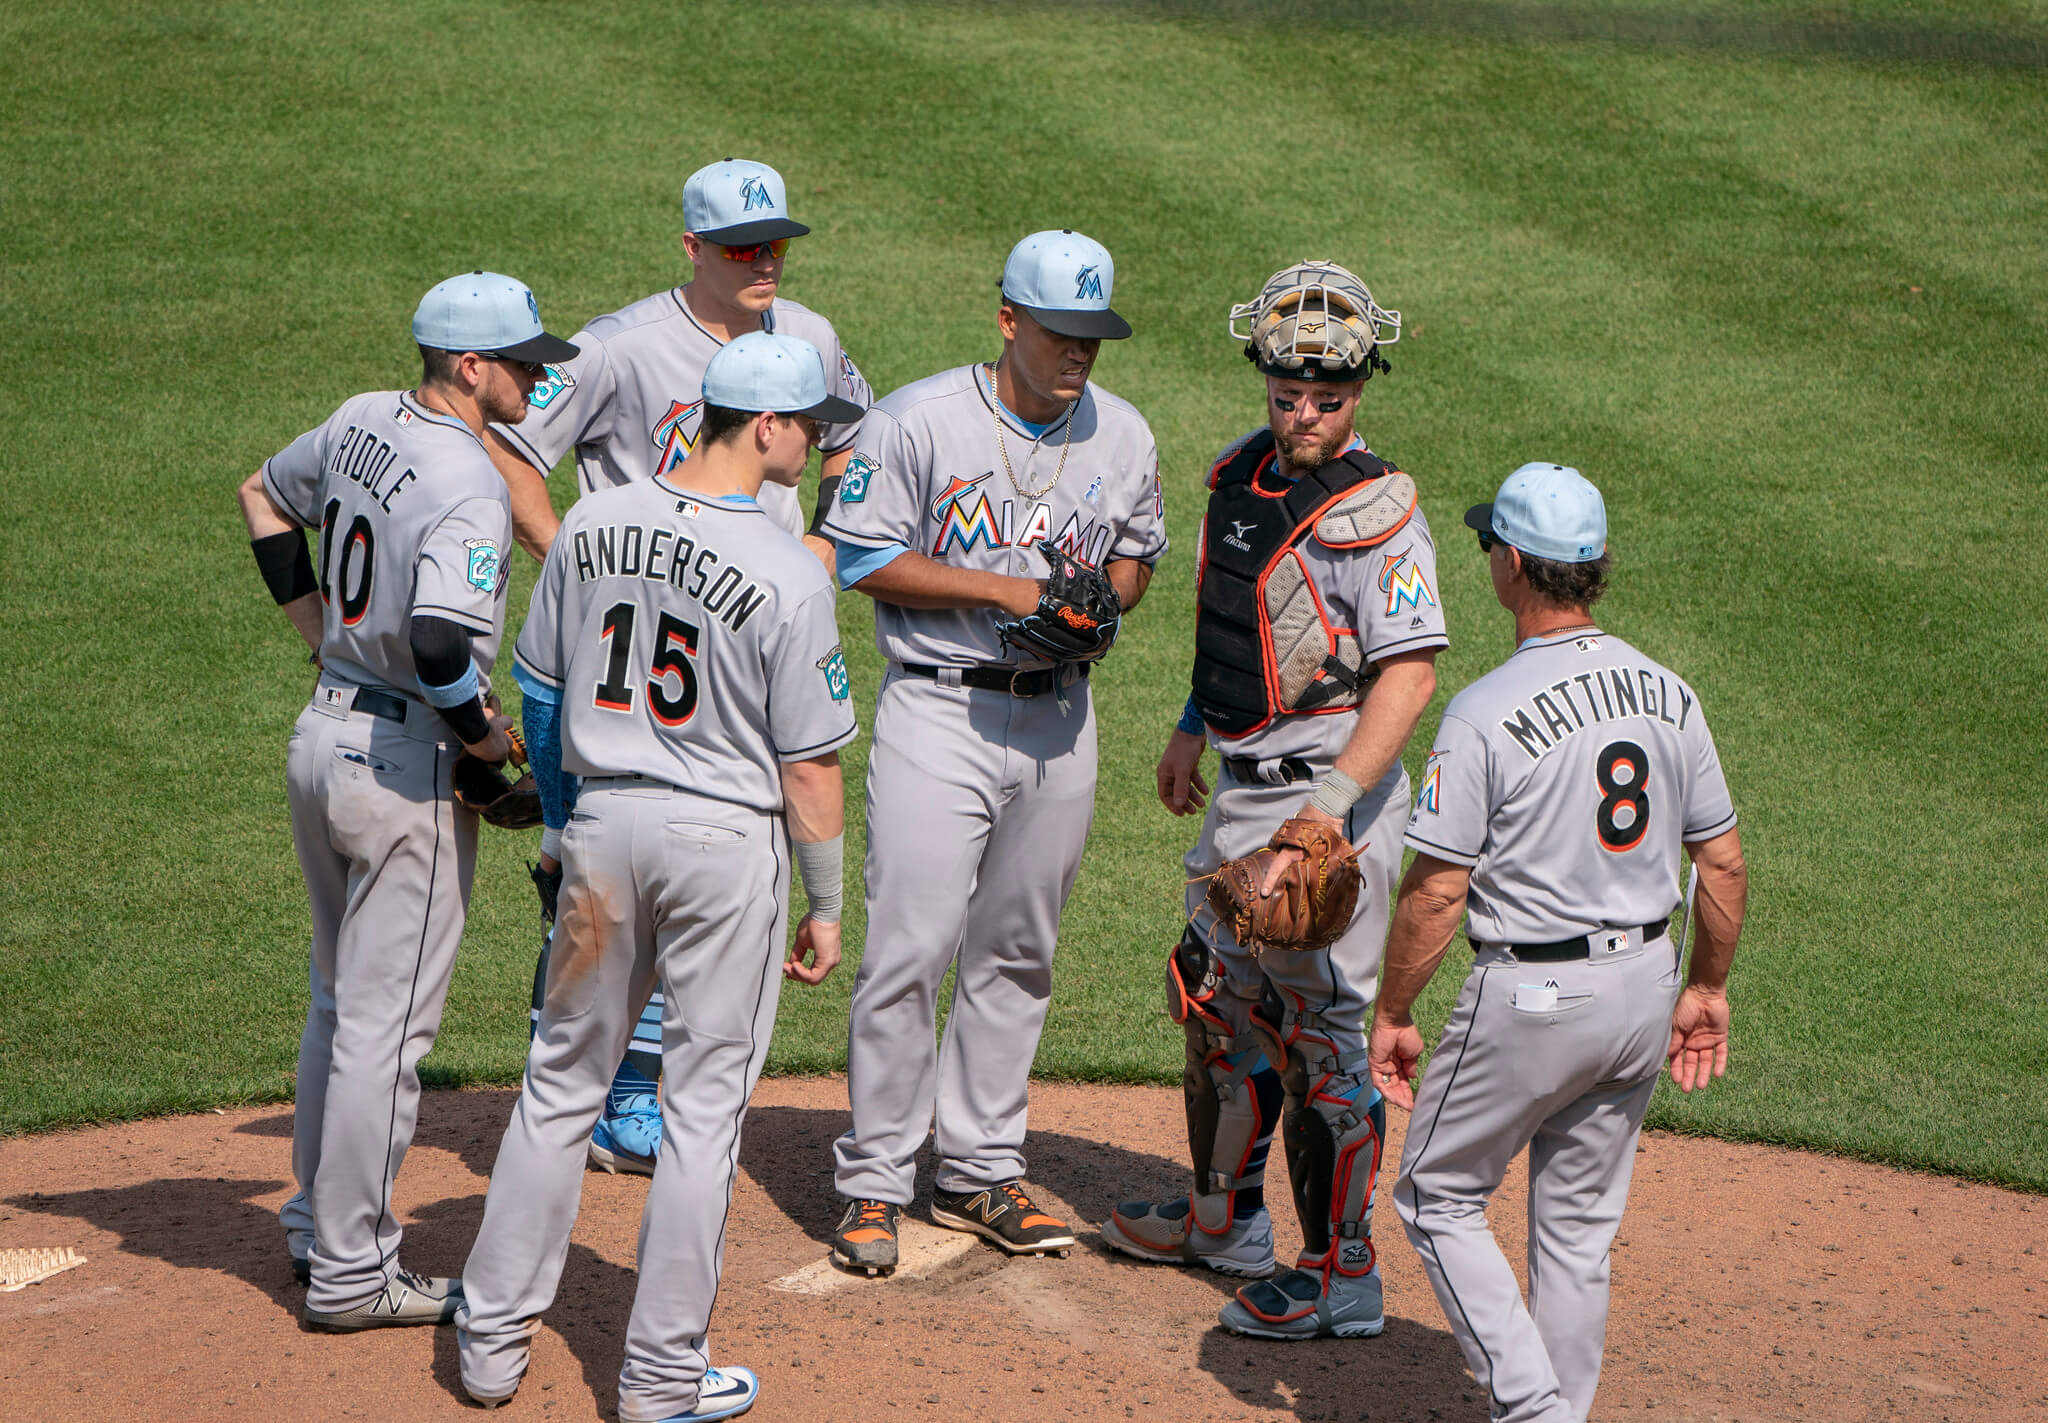 Marlins baseball players